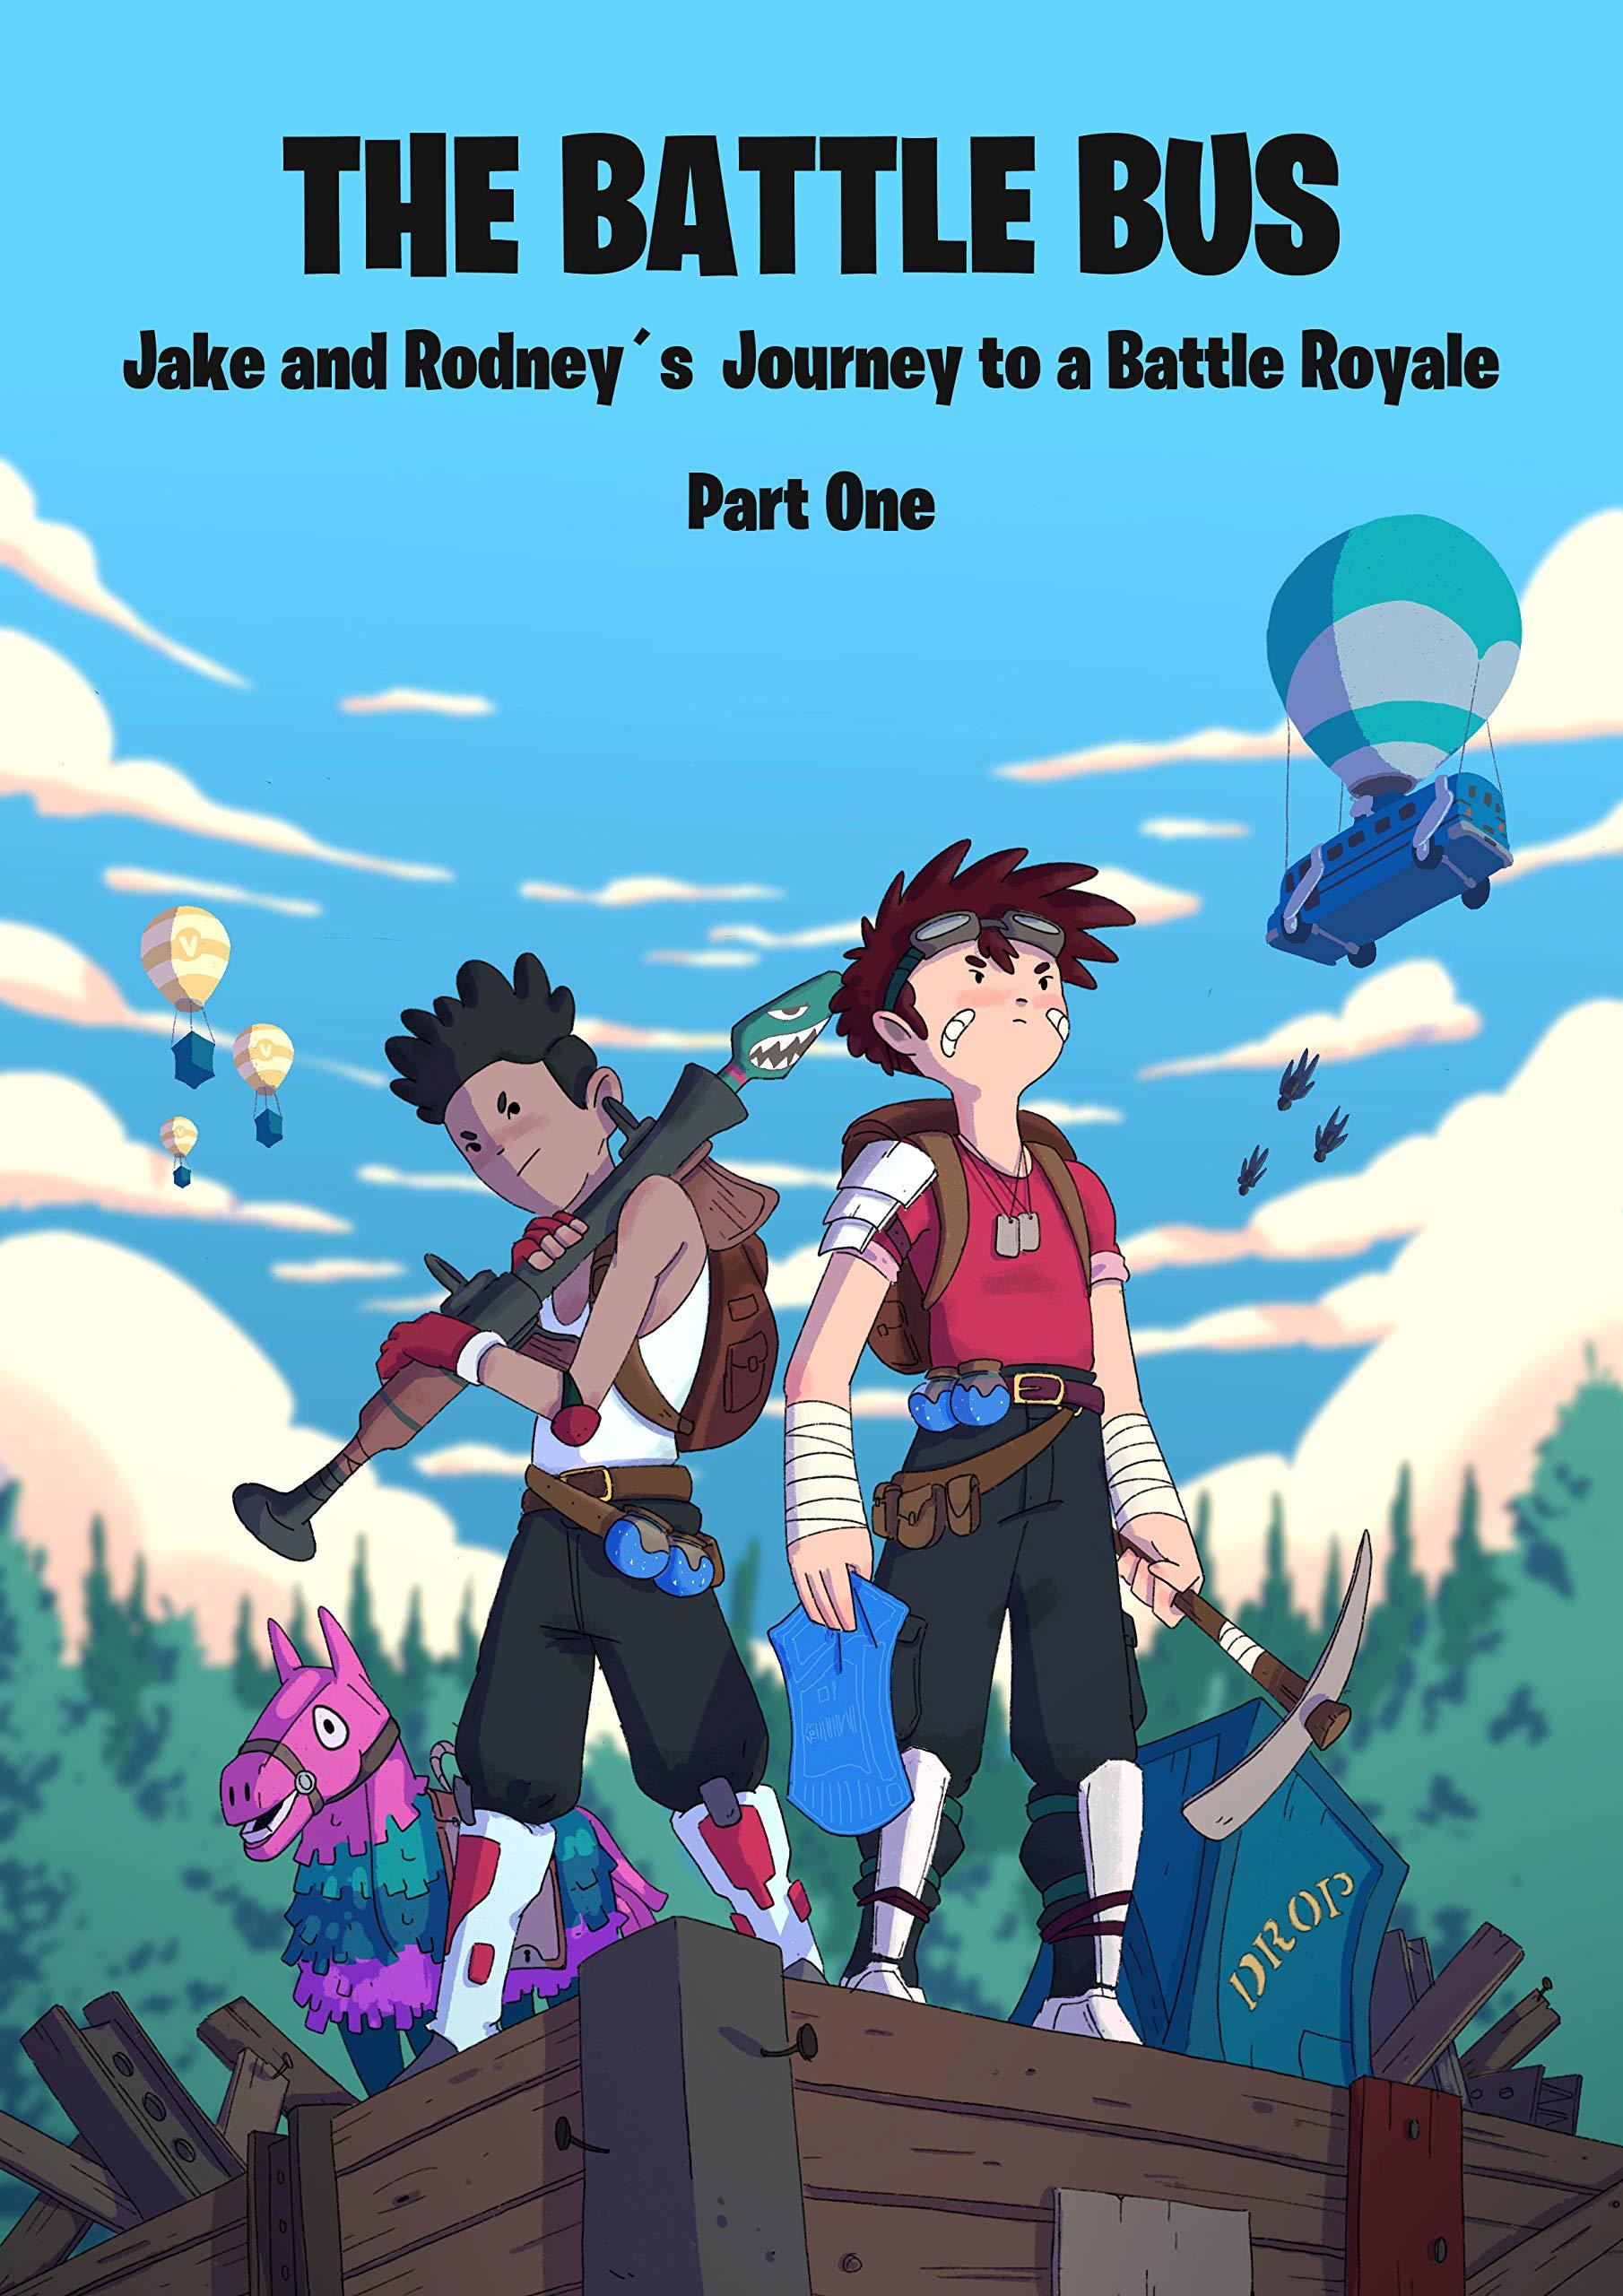 The Battle Bus: Jake and Rodney's Journey to a Battle Royale